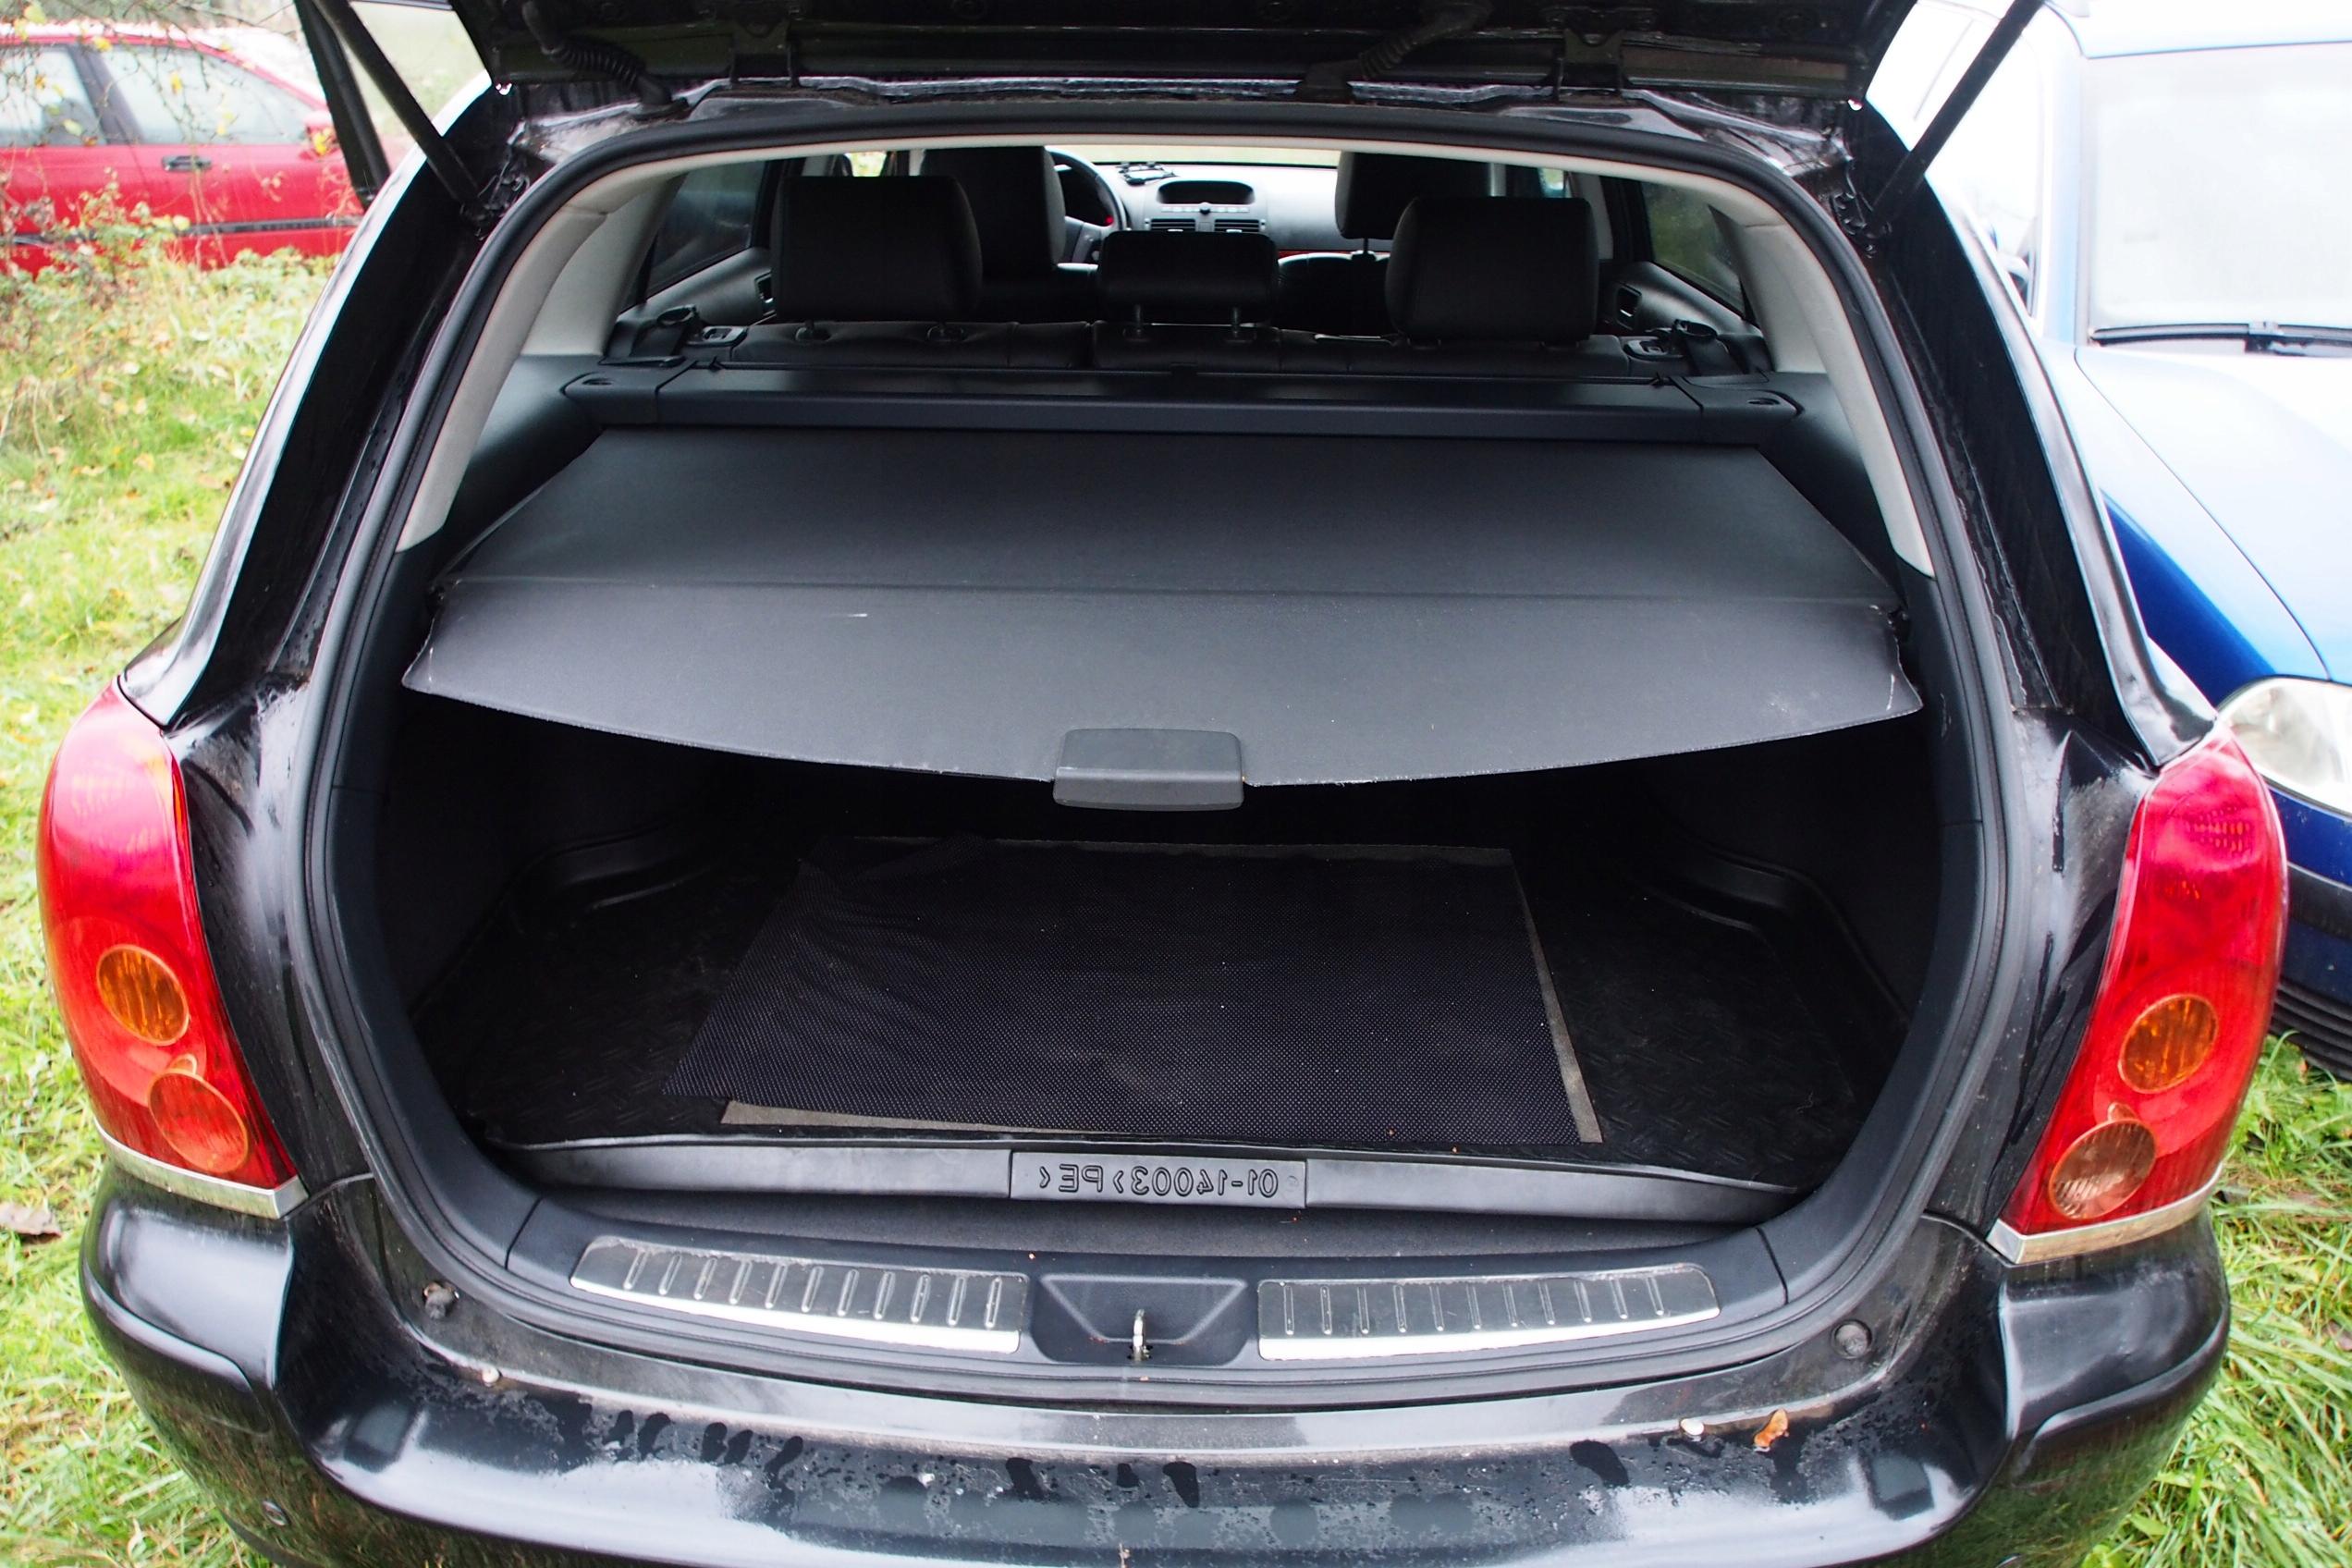 W Mega Toyota Avensis T25 kombi Roleta bagażnika - 7670467365 - oficjalne NN02